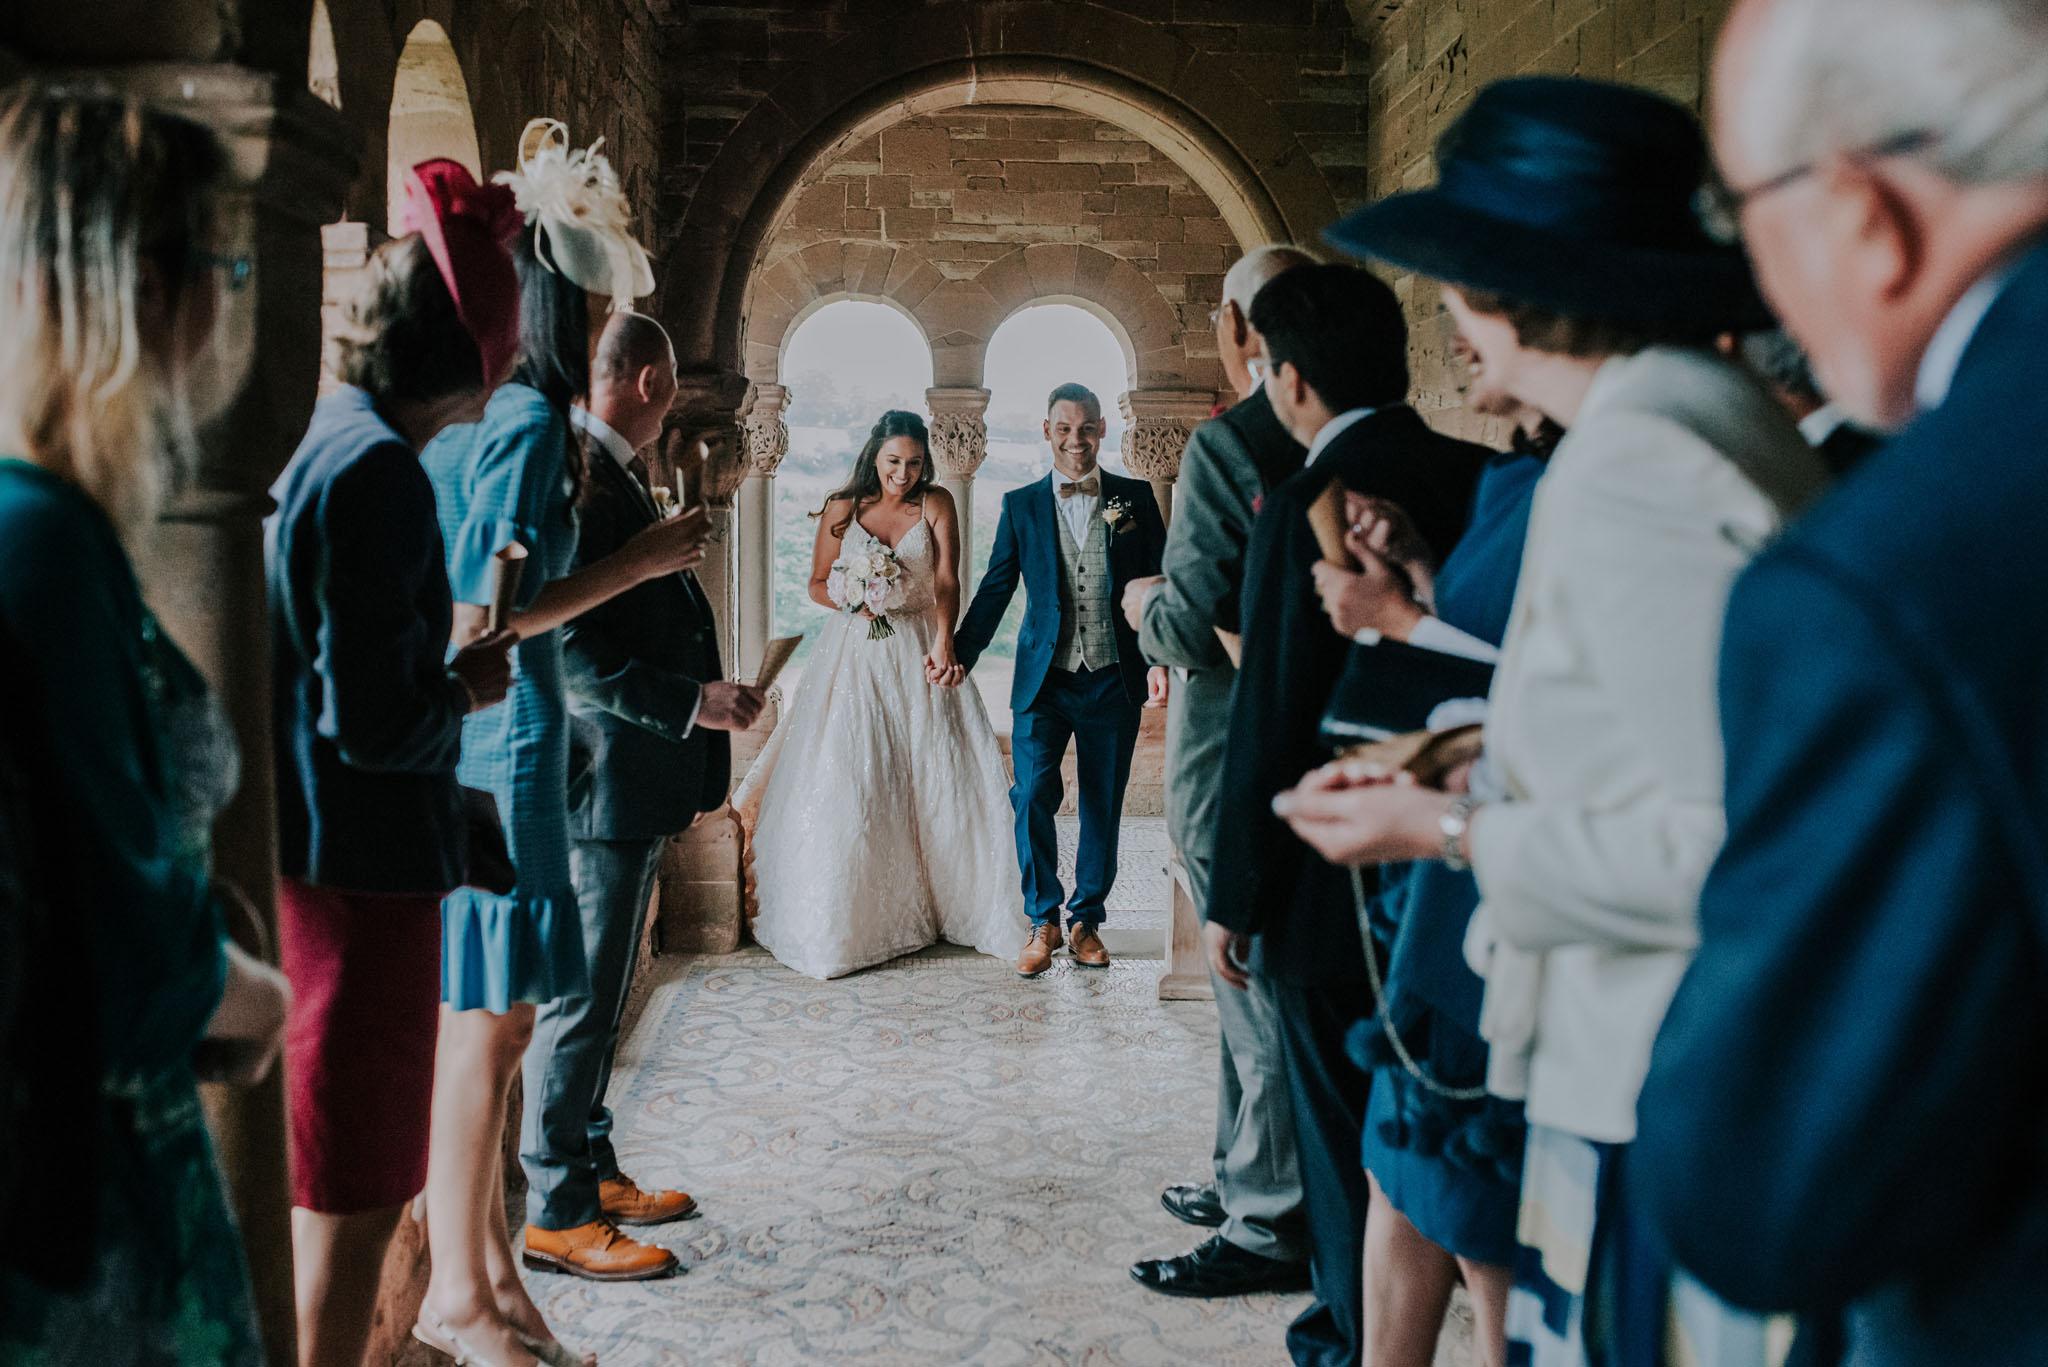 wedding-photographer-glewstone-court-hereford-scott-stockwell-photography255.jpg